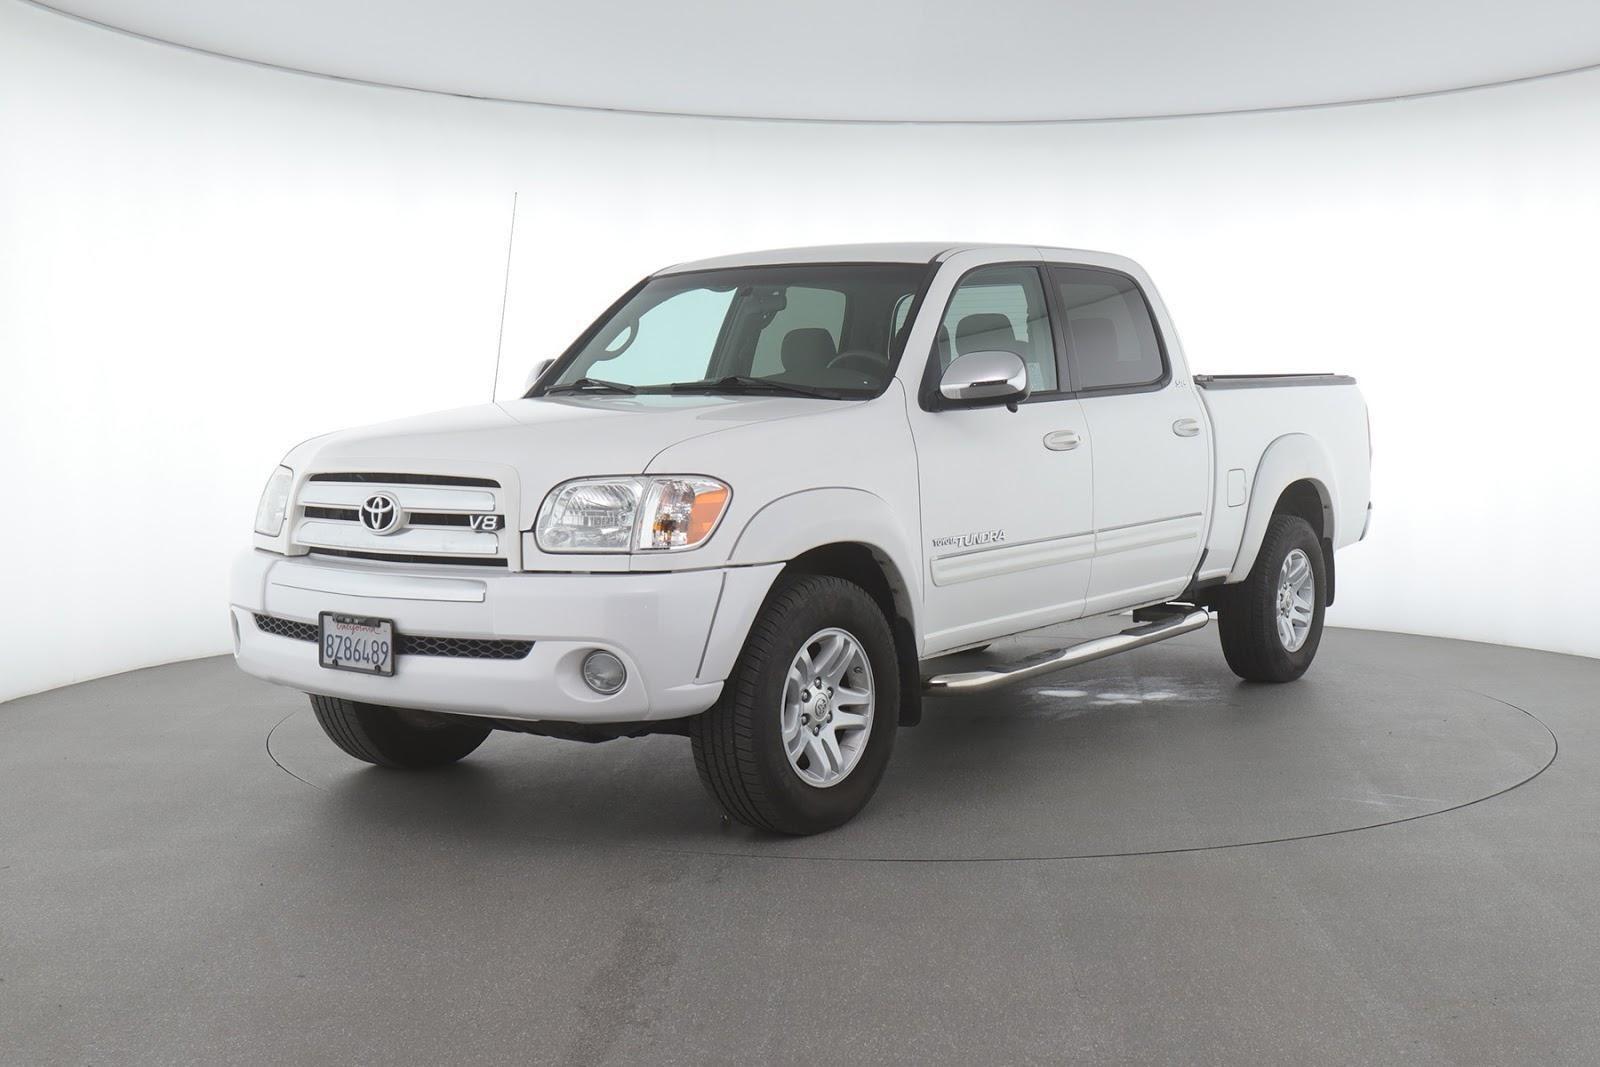 2006 Toyota Tundra SR5 (from $14,950)